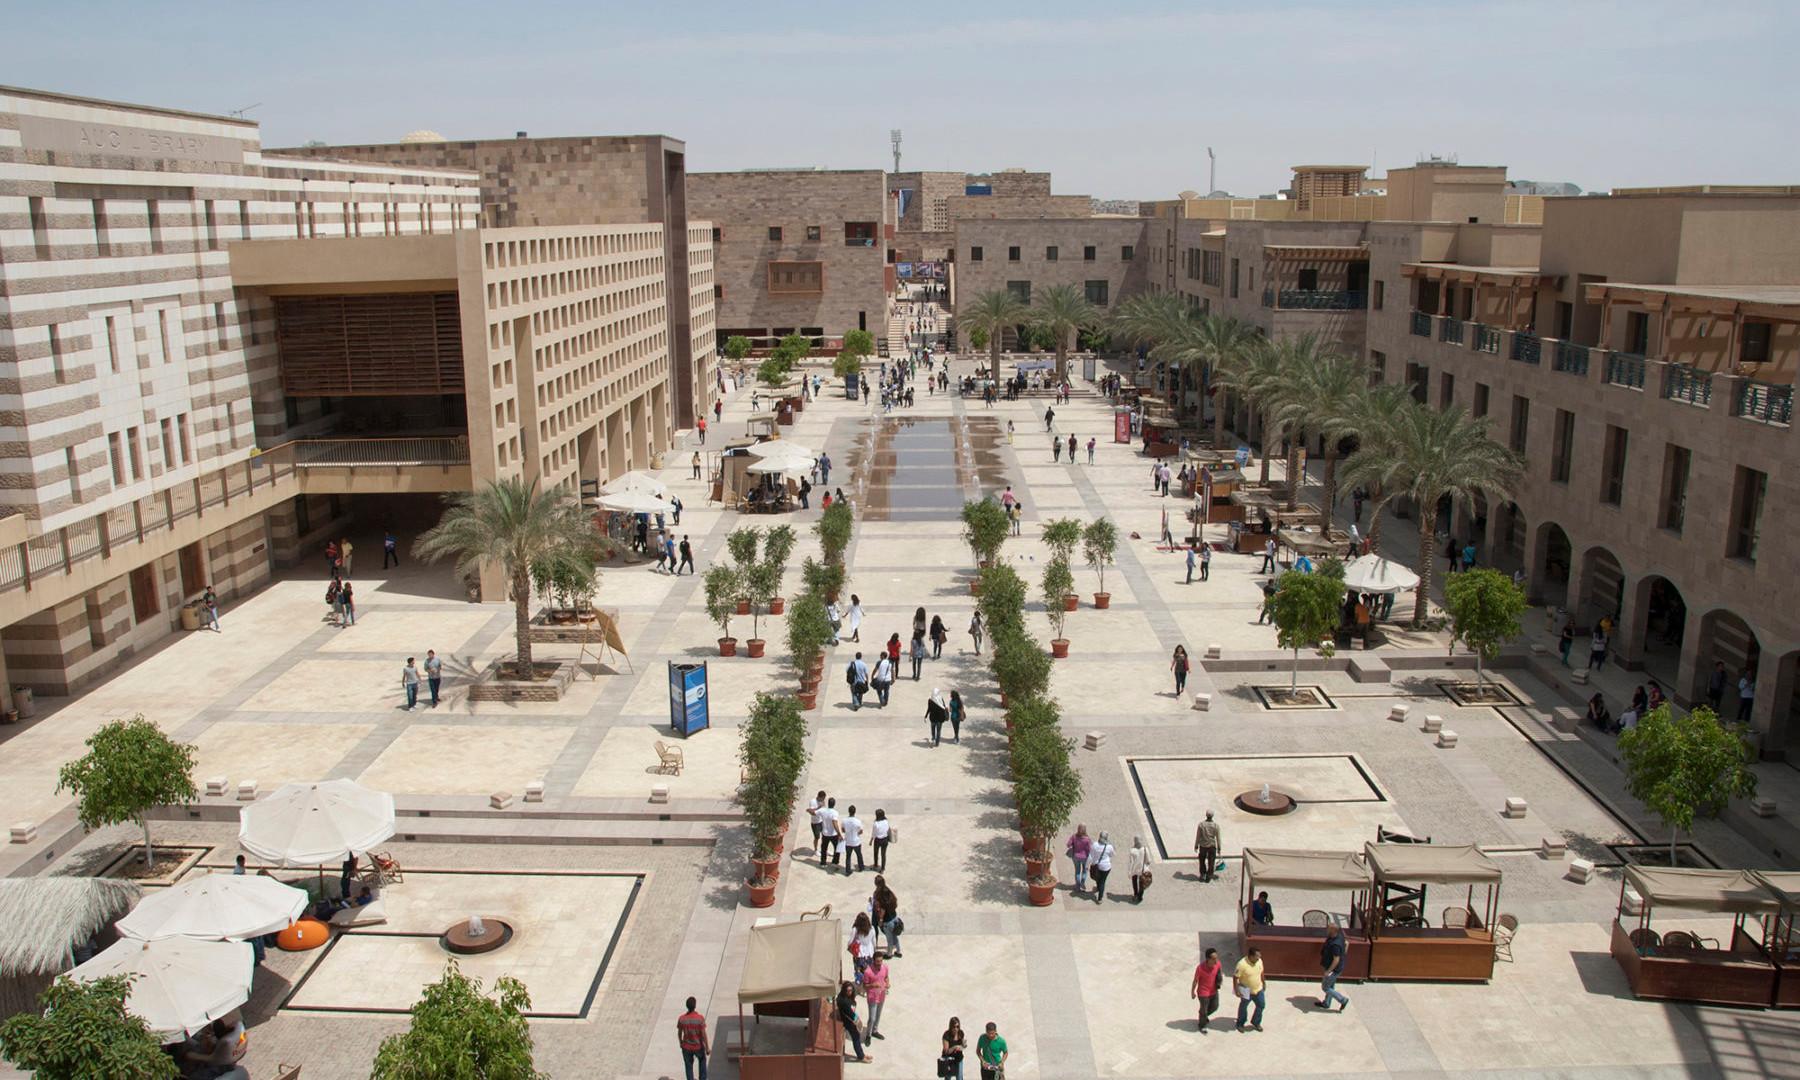 09.American-University-in-Cairo-1800x120